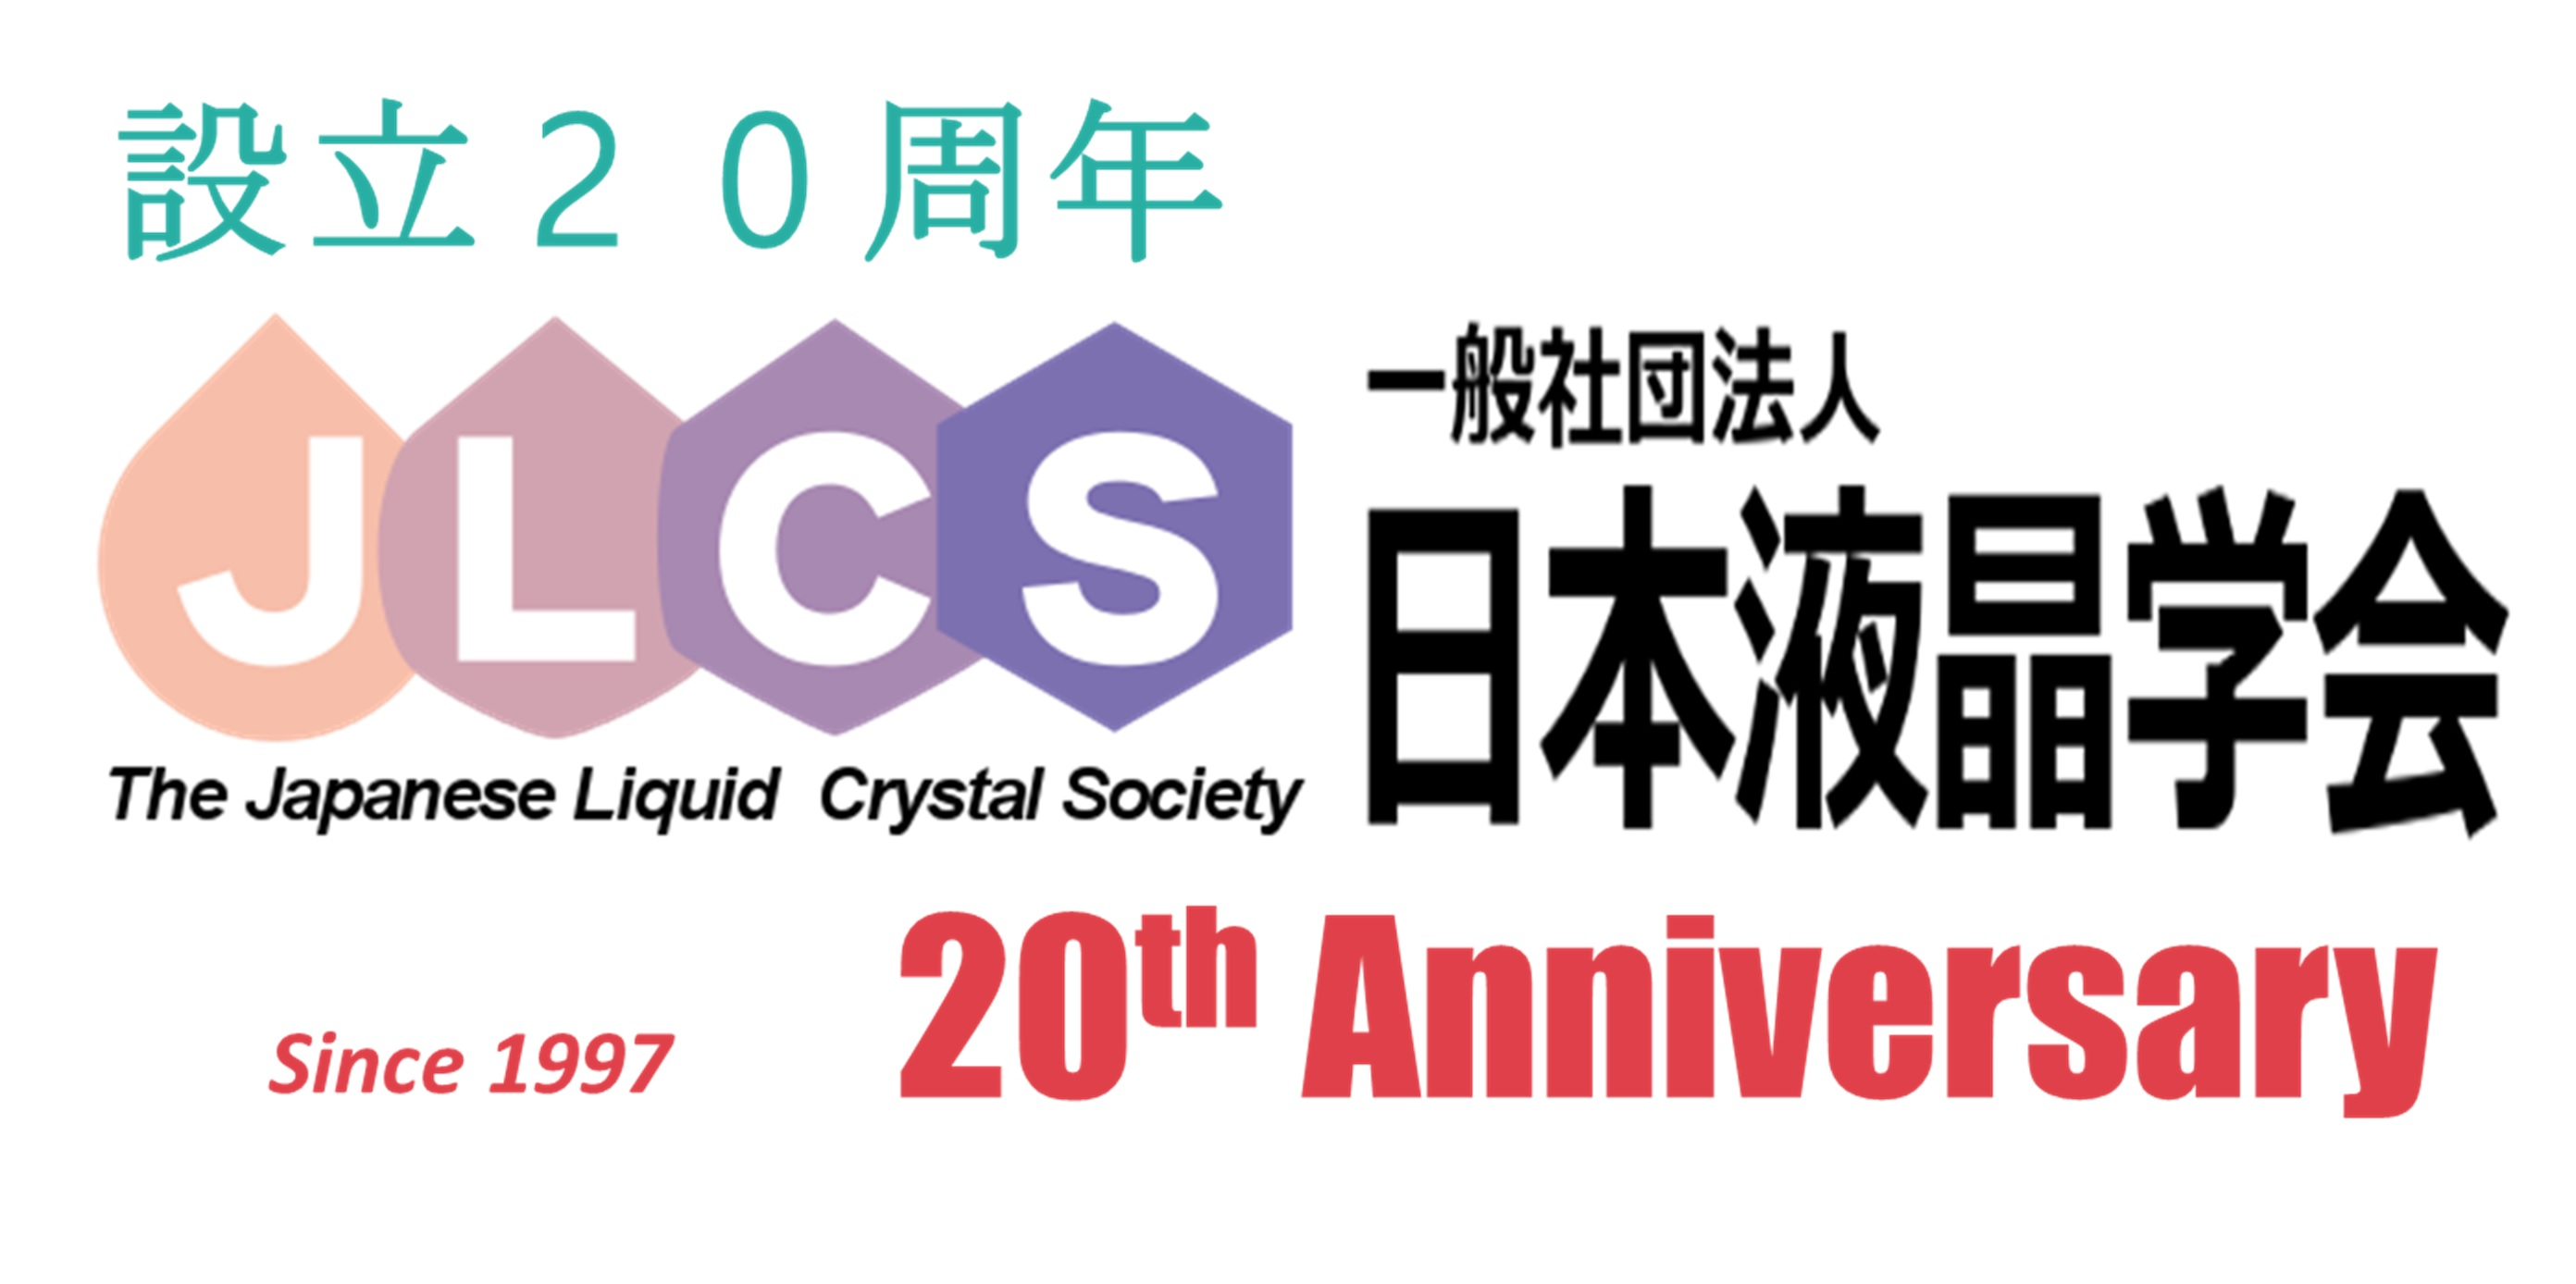 JLCS 20th Anniversary Logo